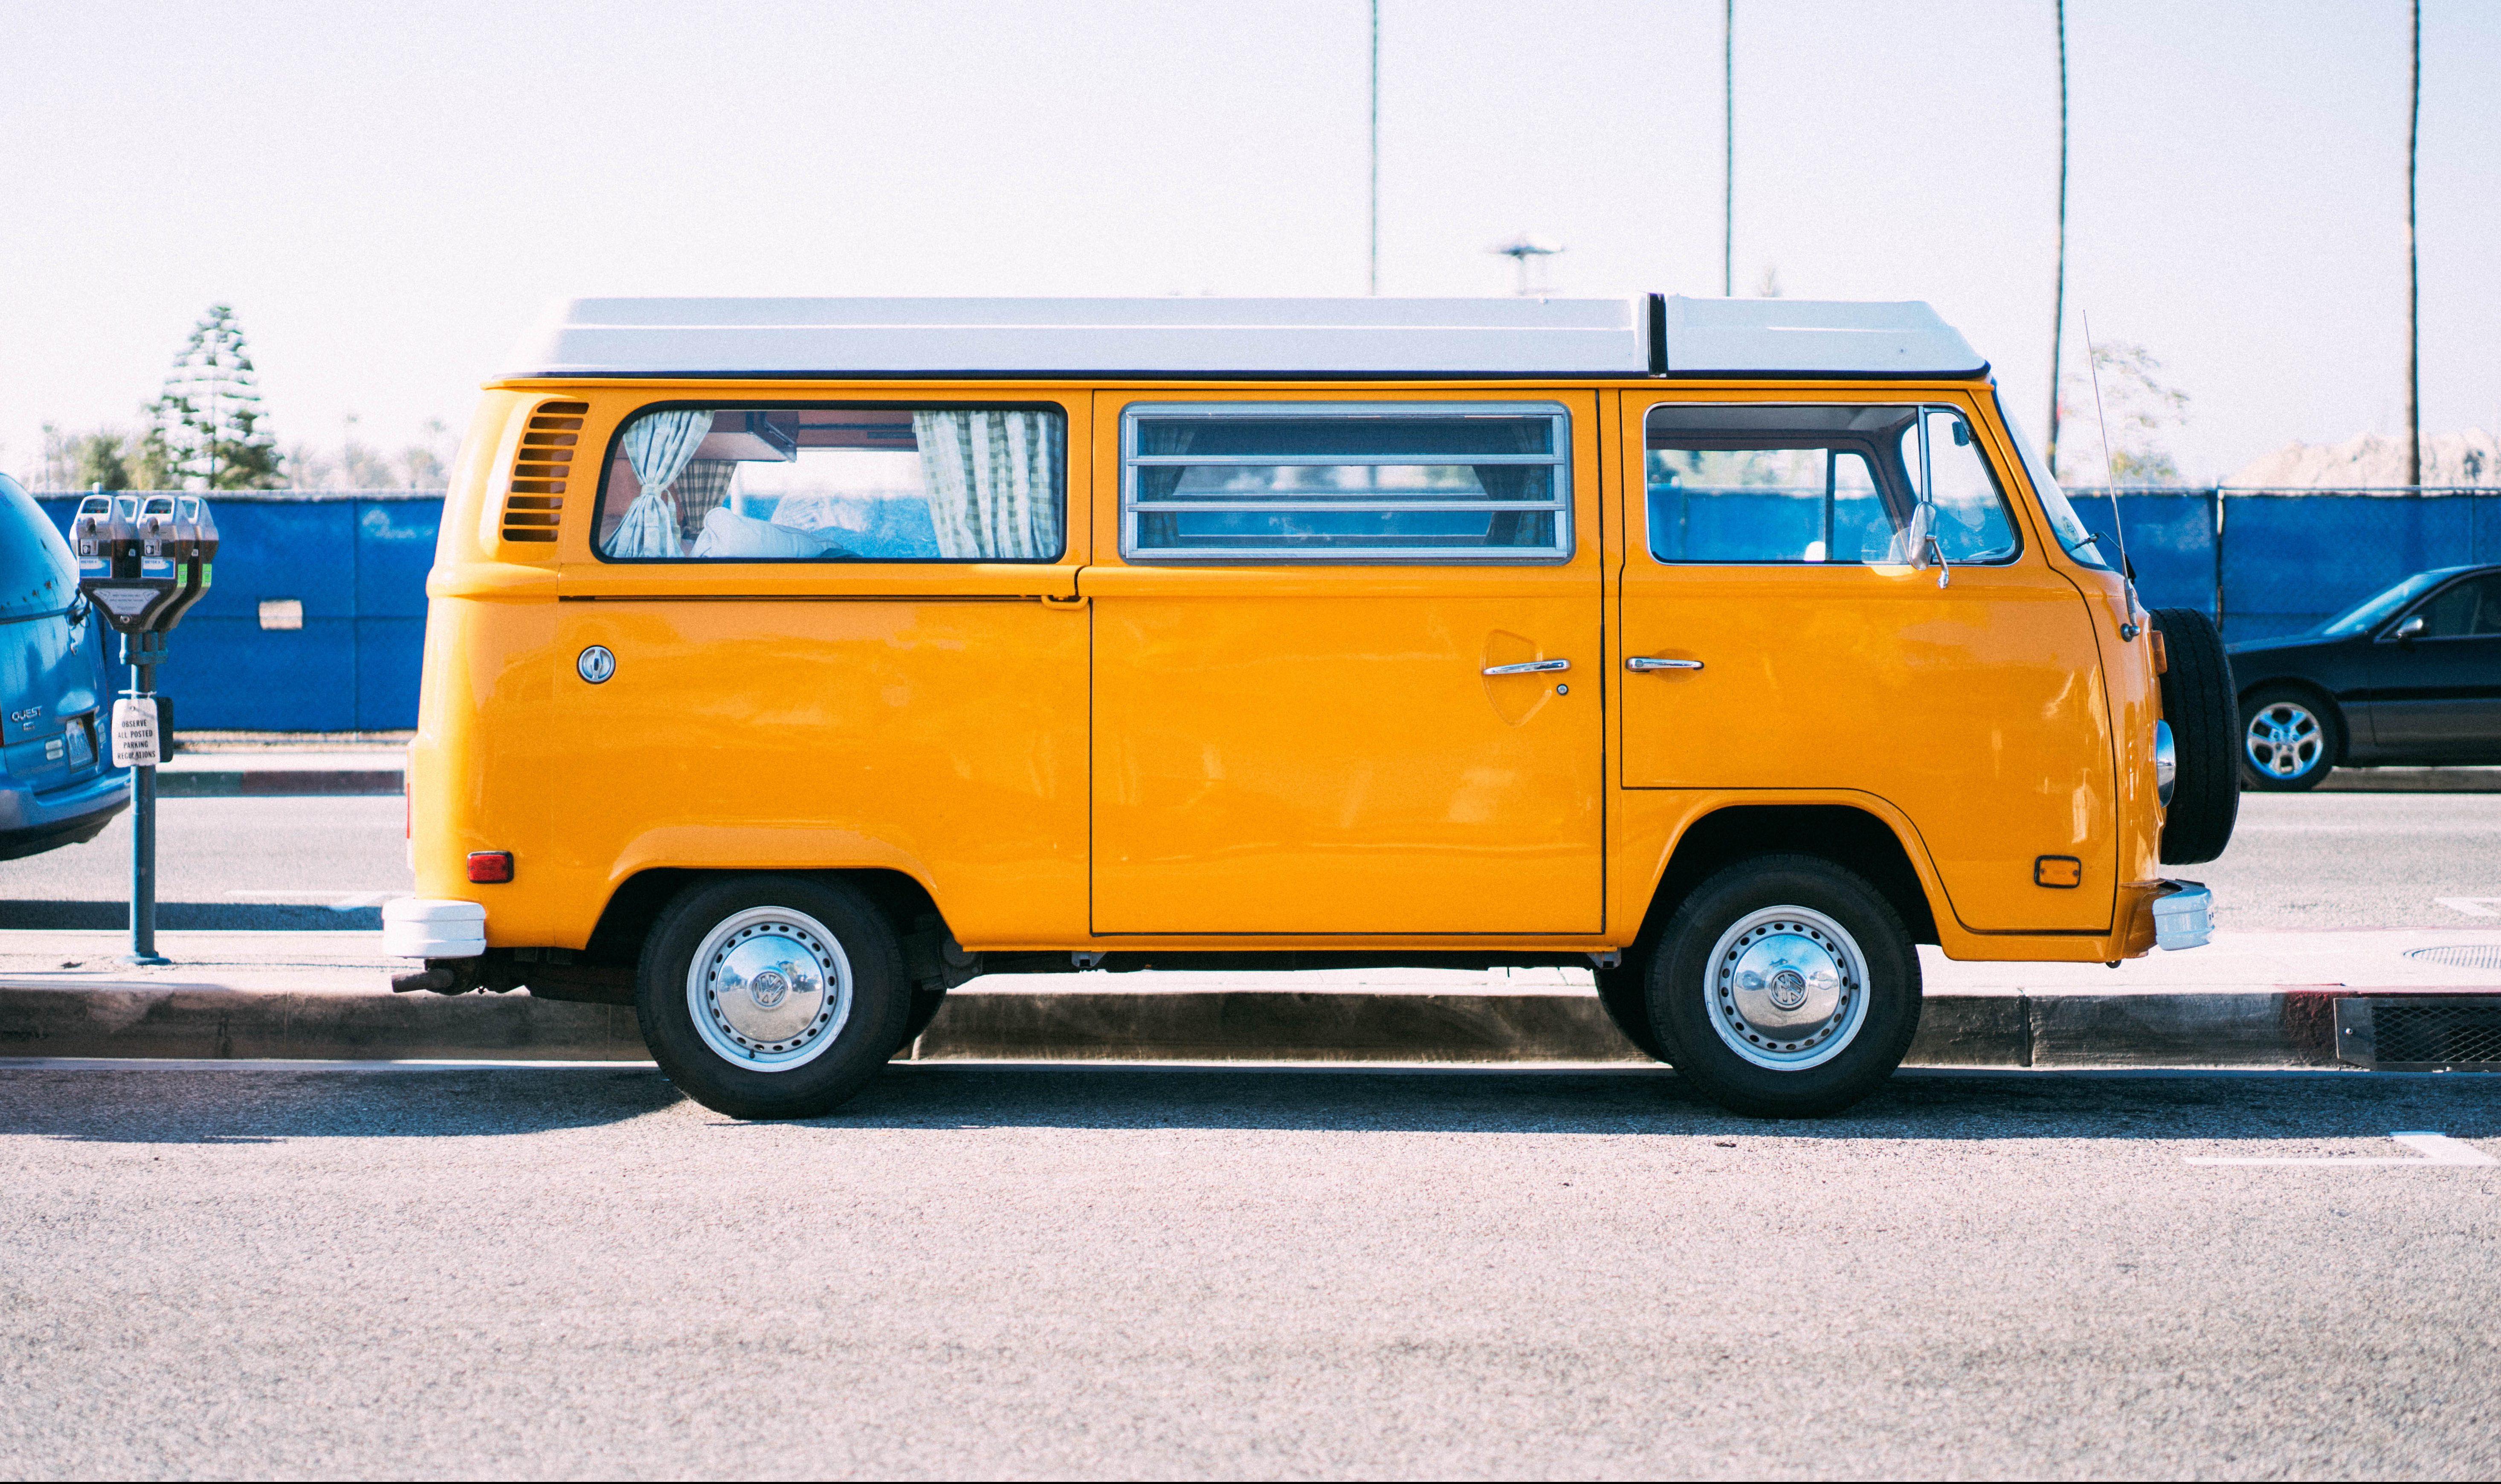 A yellow VW van on the sidewalk.